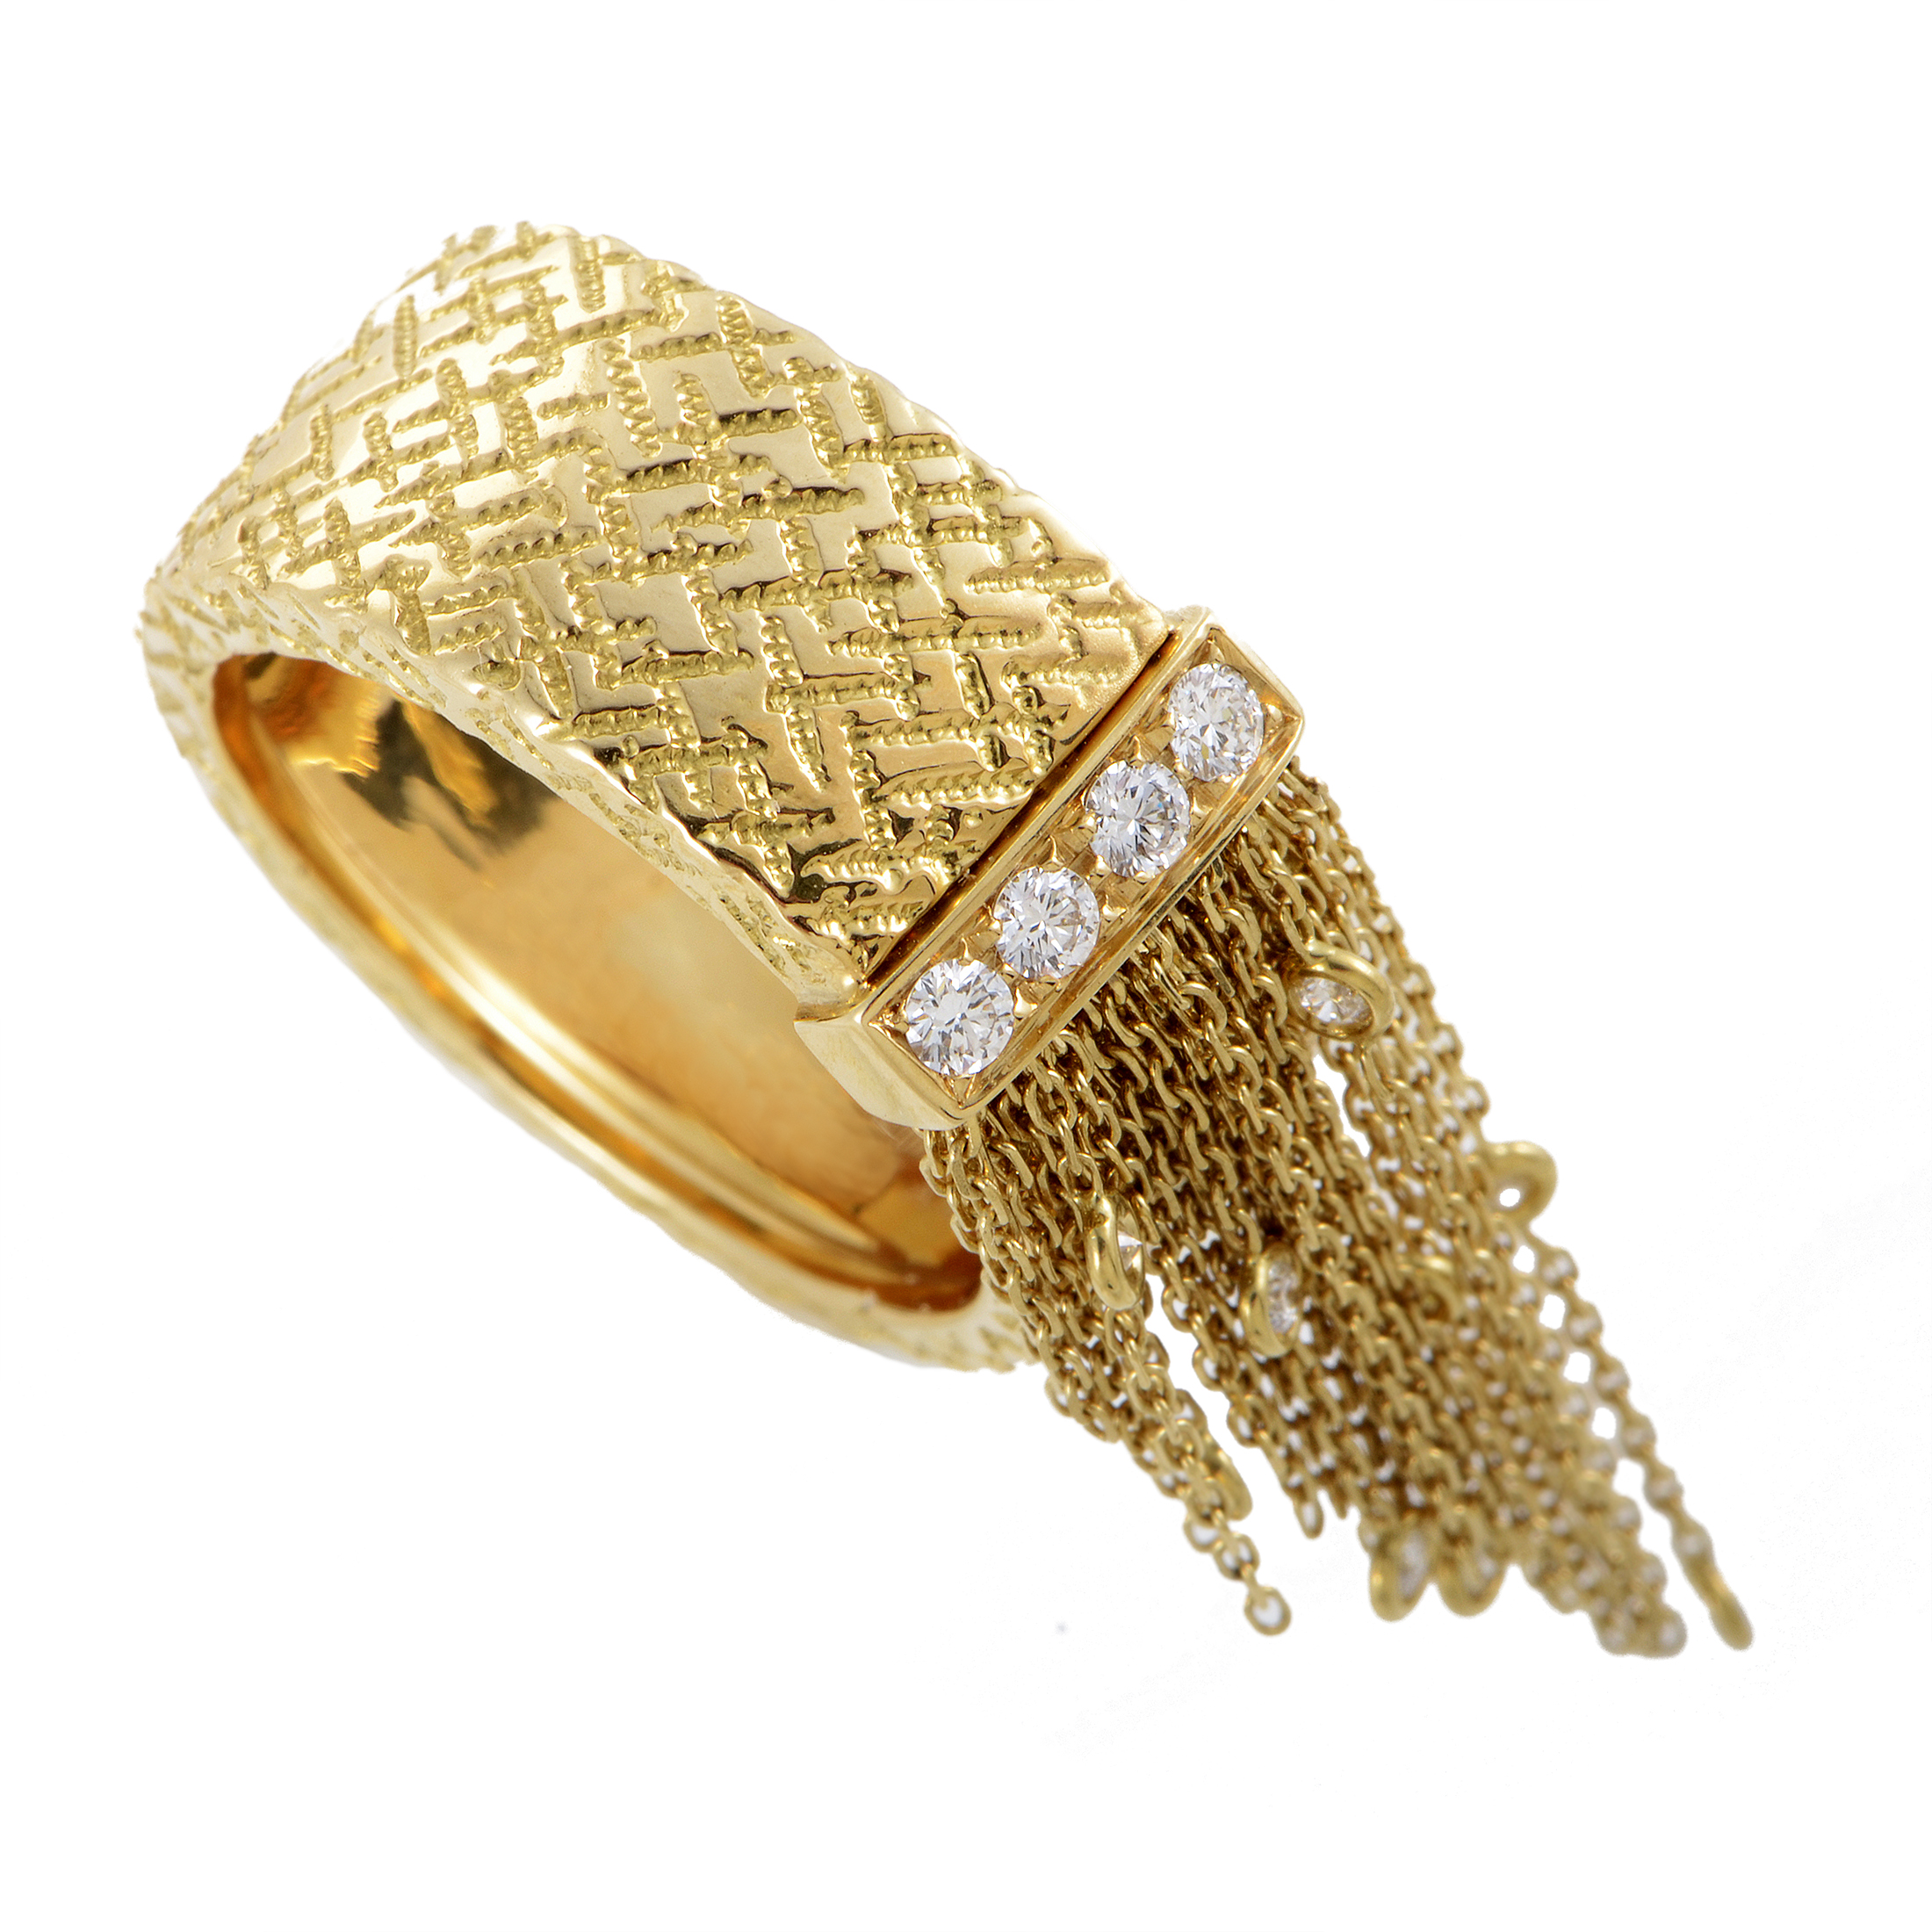 Boucheron Delilah Women's 18K Yellow Gold Diamond Fringe Band Ring